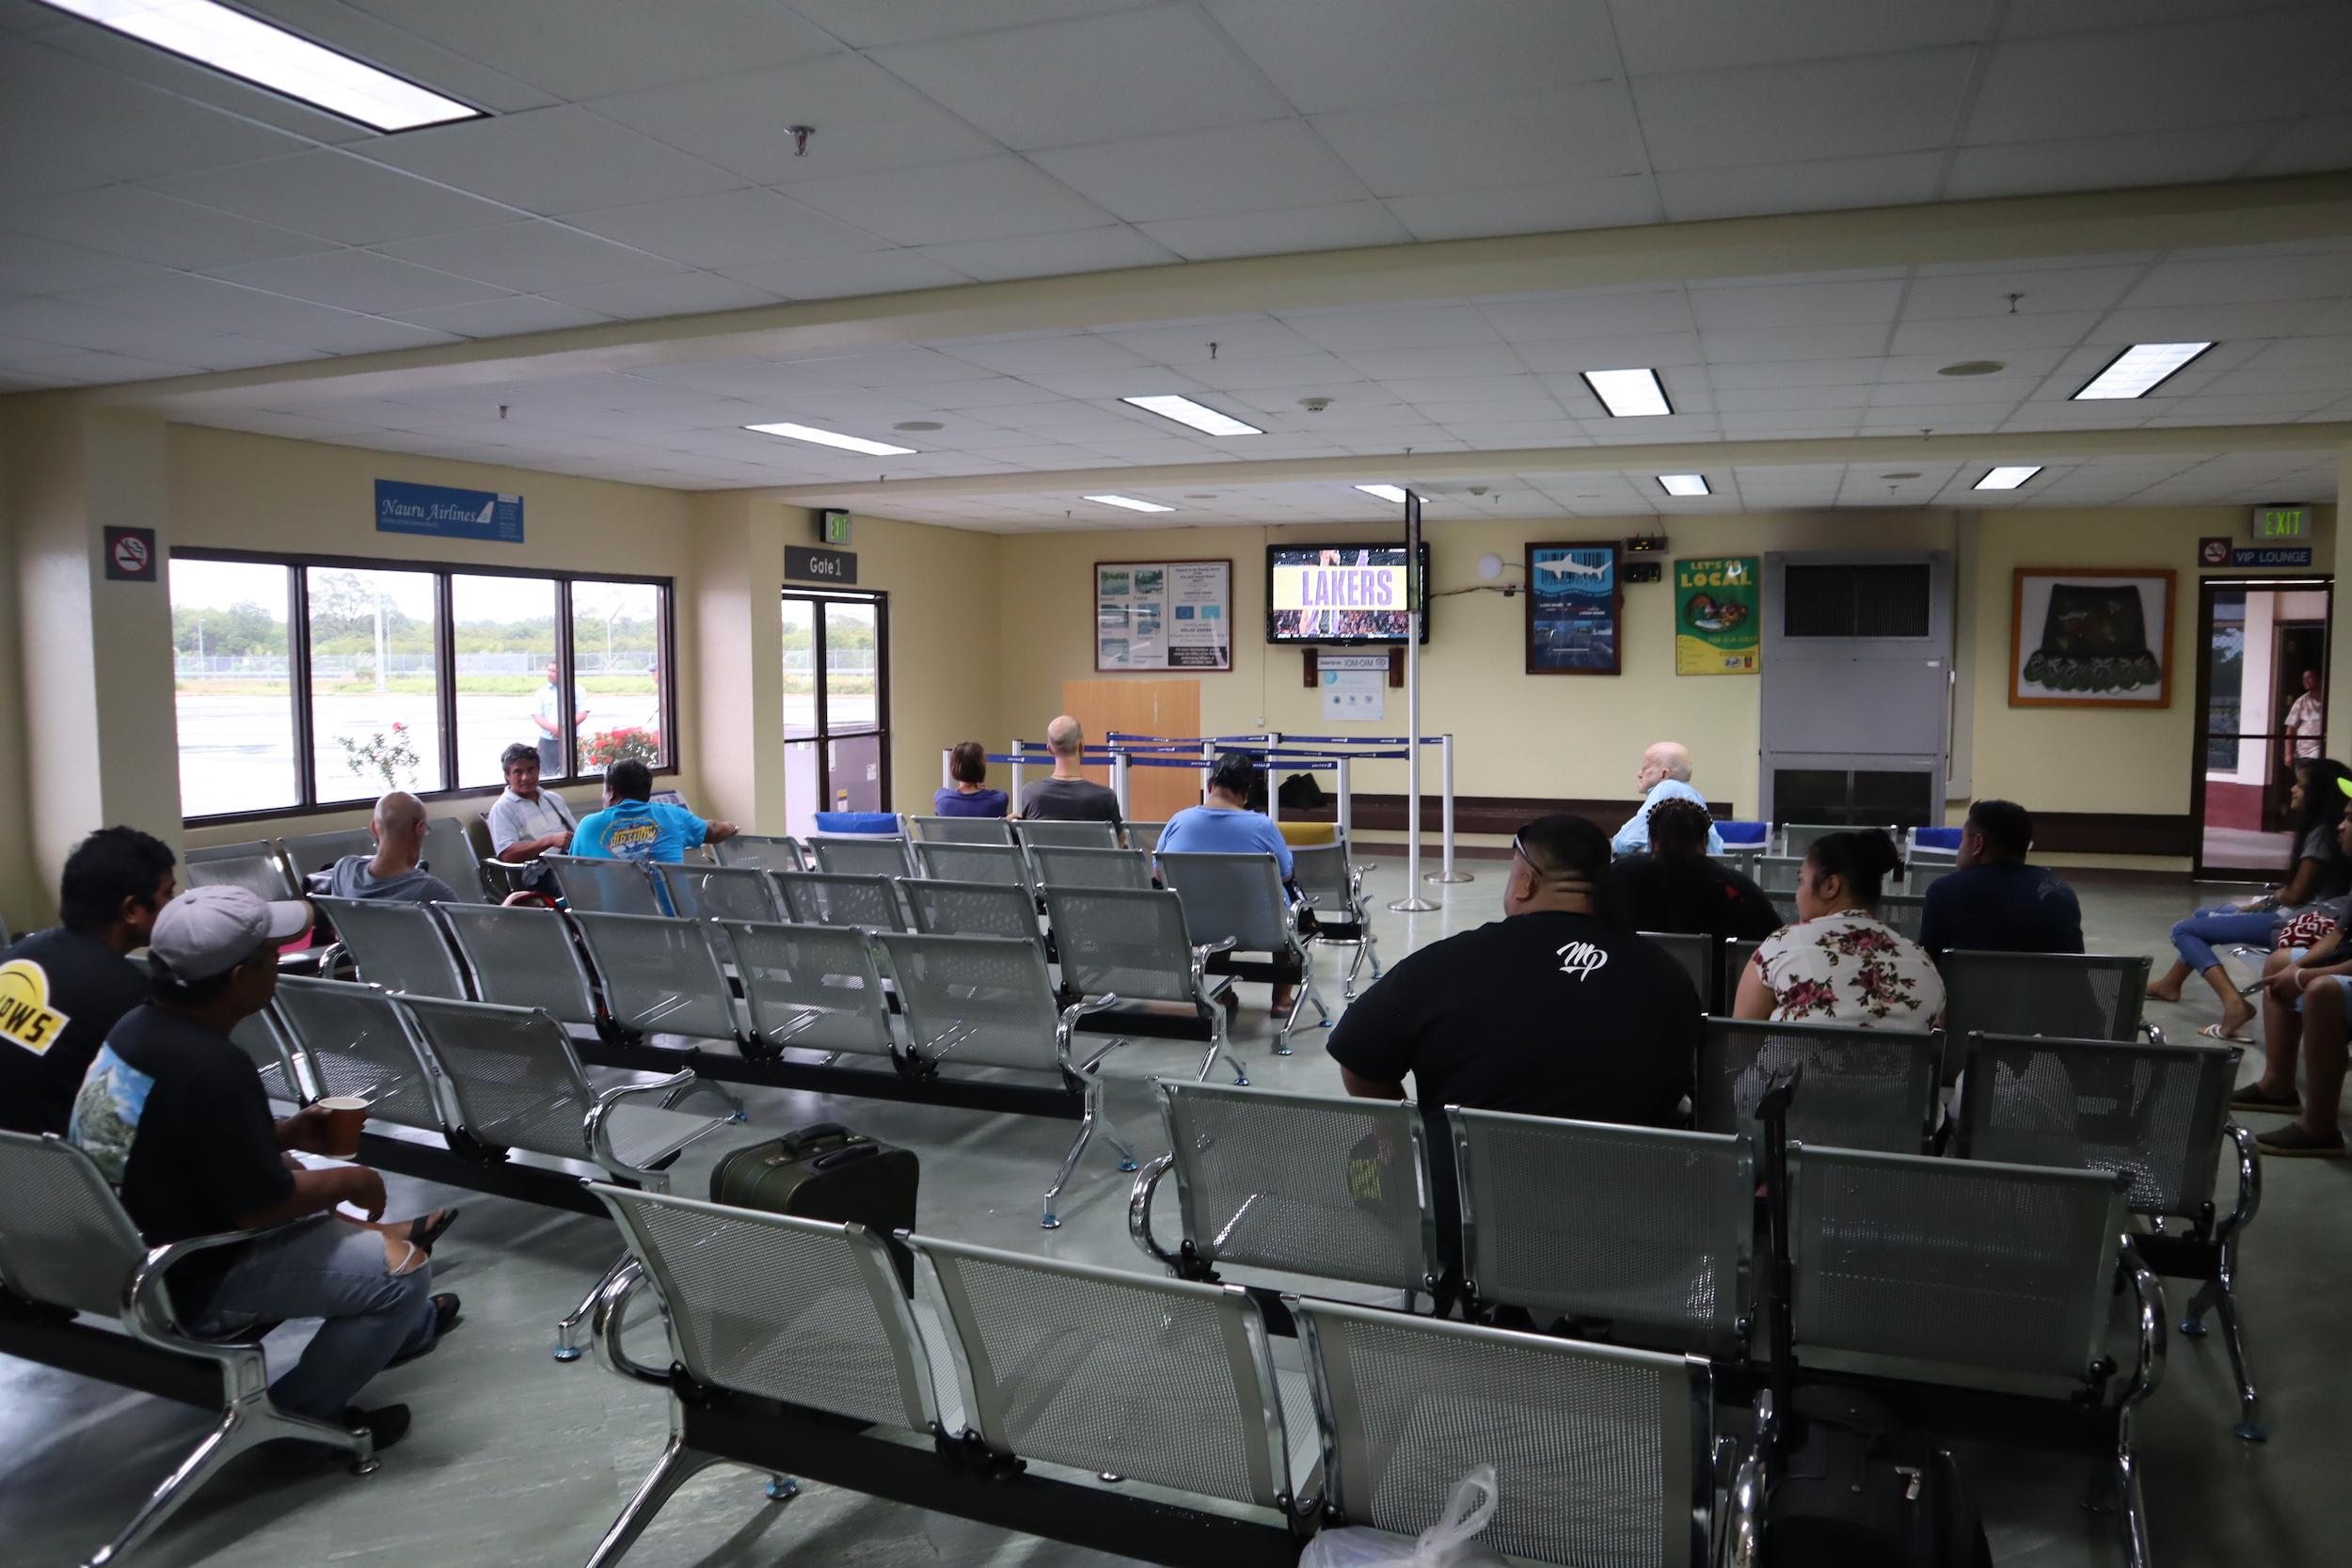 Pohnpei International Airport – Waiting room